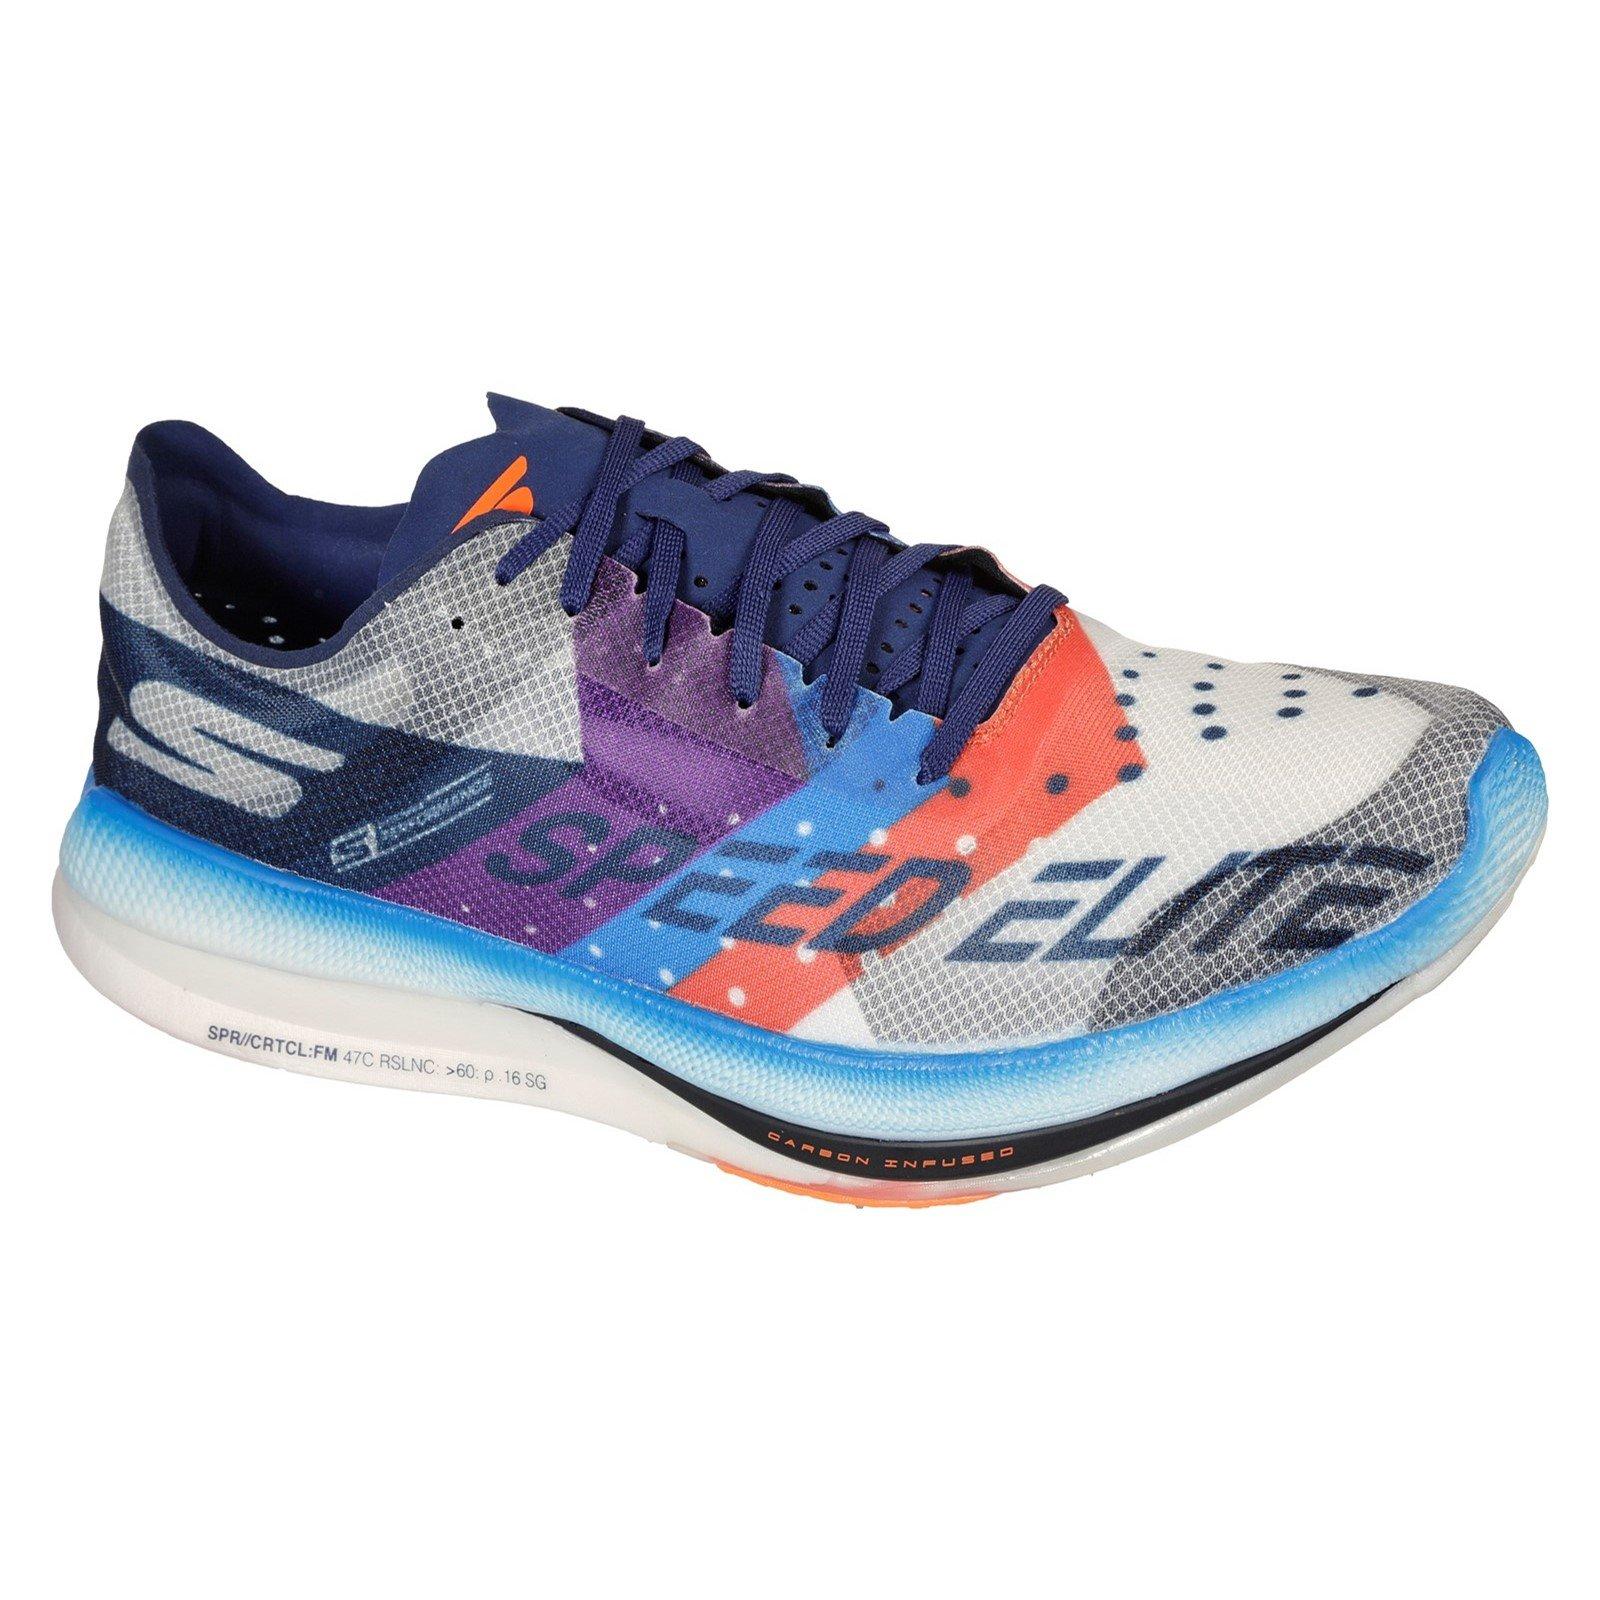 Skechers Men's Go Run Speed Elite Trainer Multicolor 32700 - White/Multi 7